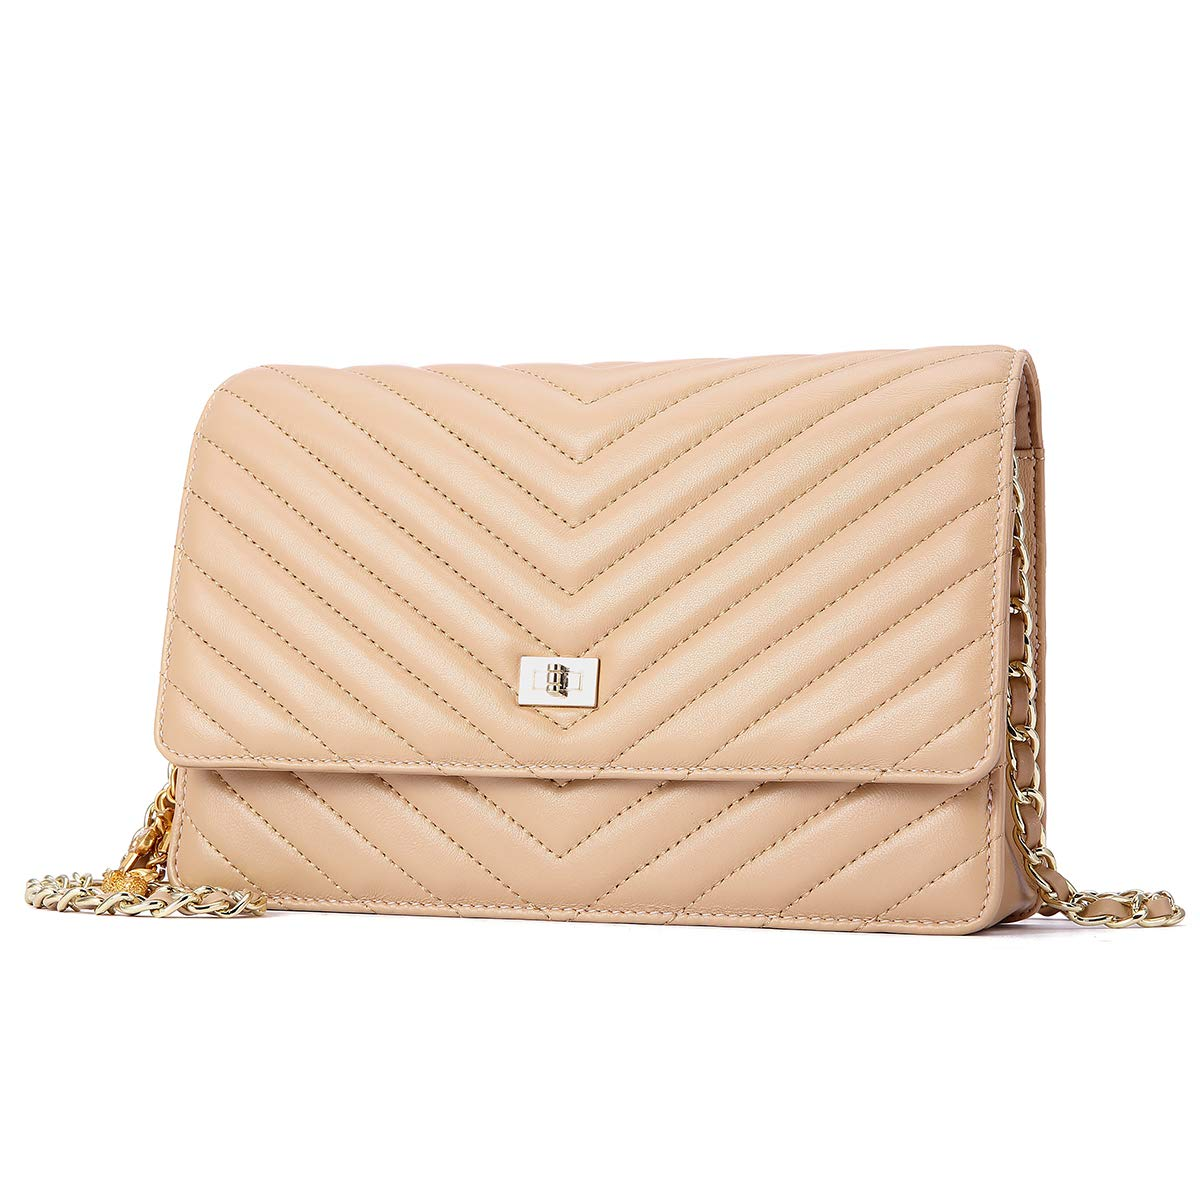 Neverout Shoulder Bags for Women Sheepskin Leather Thread Style Crossbody  Purse (NP2135) (apricot)  Handbags  Amazon.com 0477518dd61c9